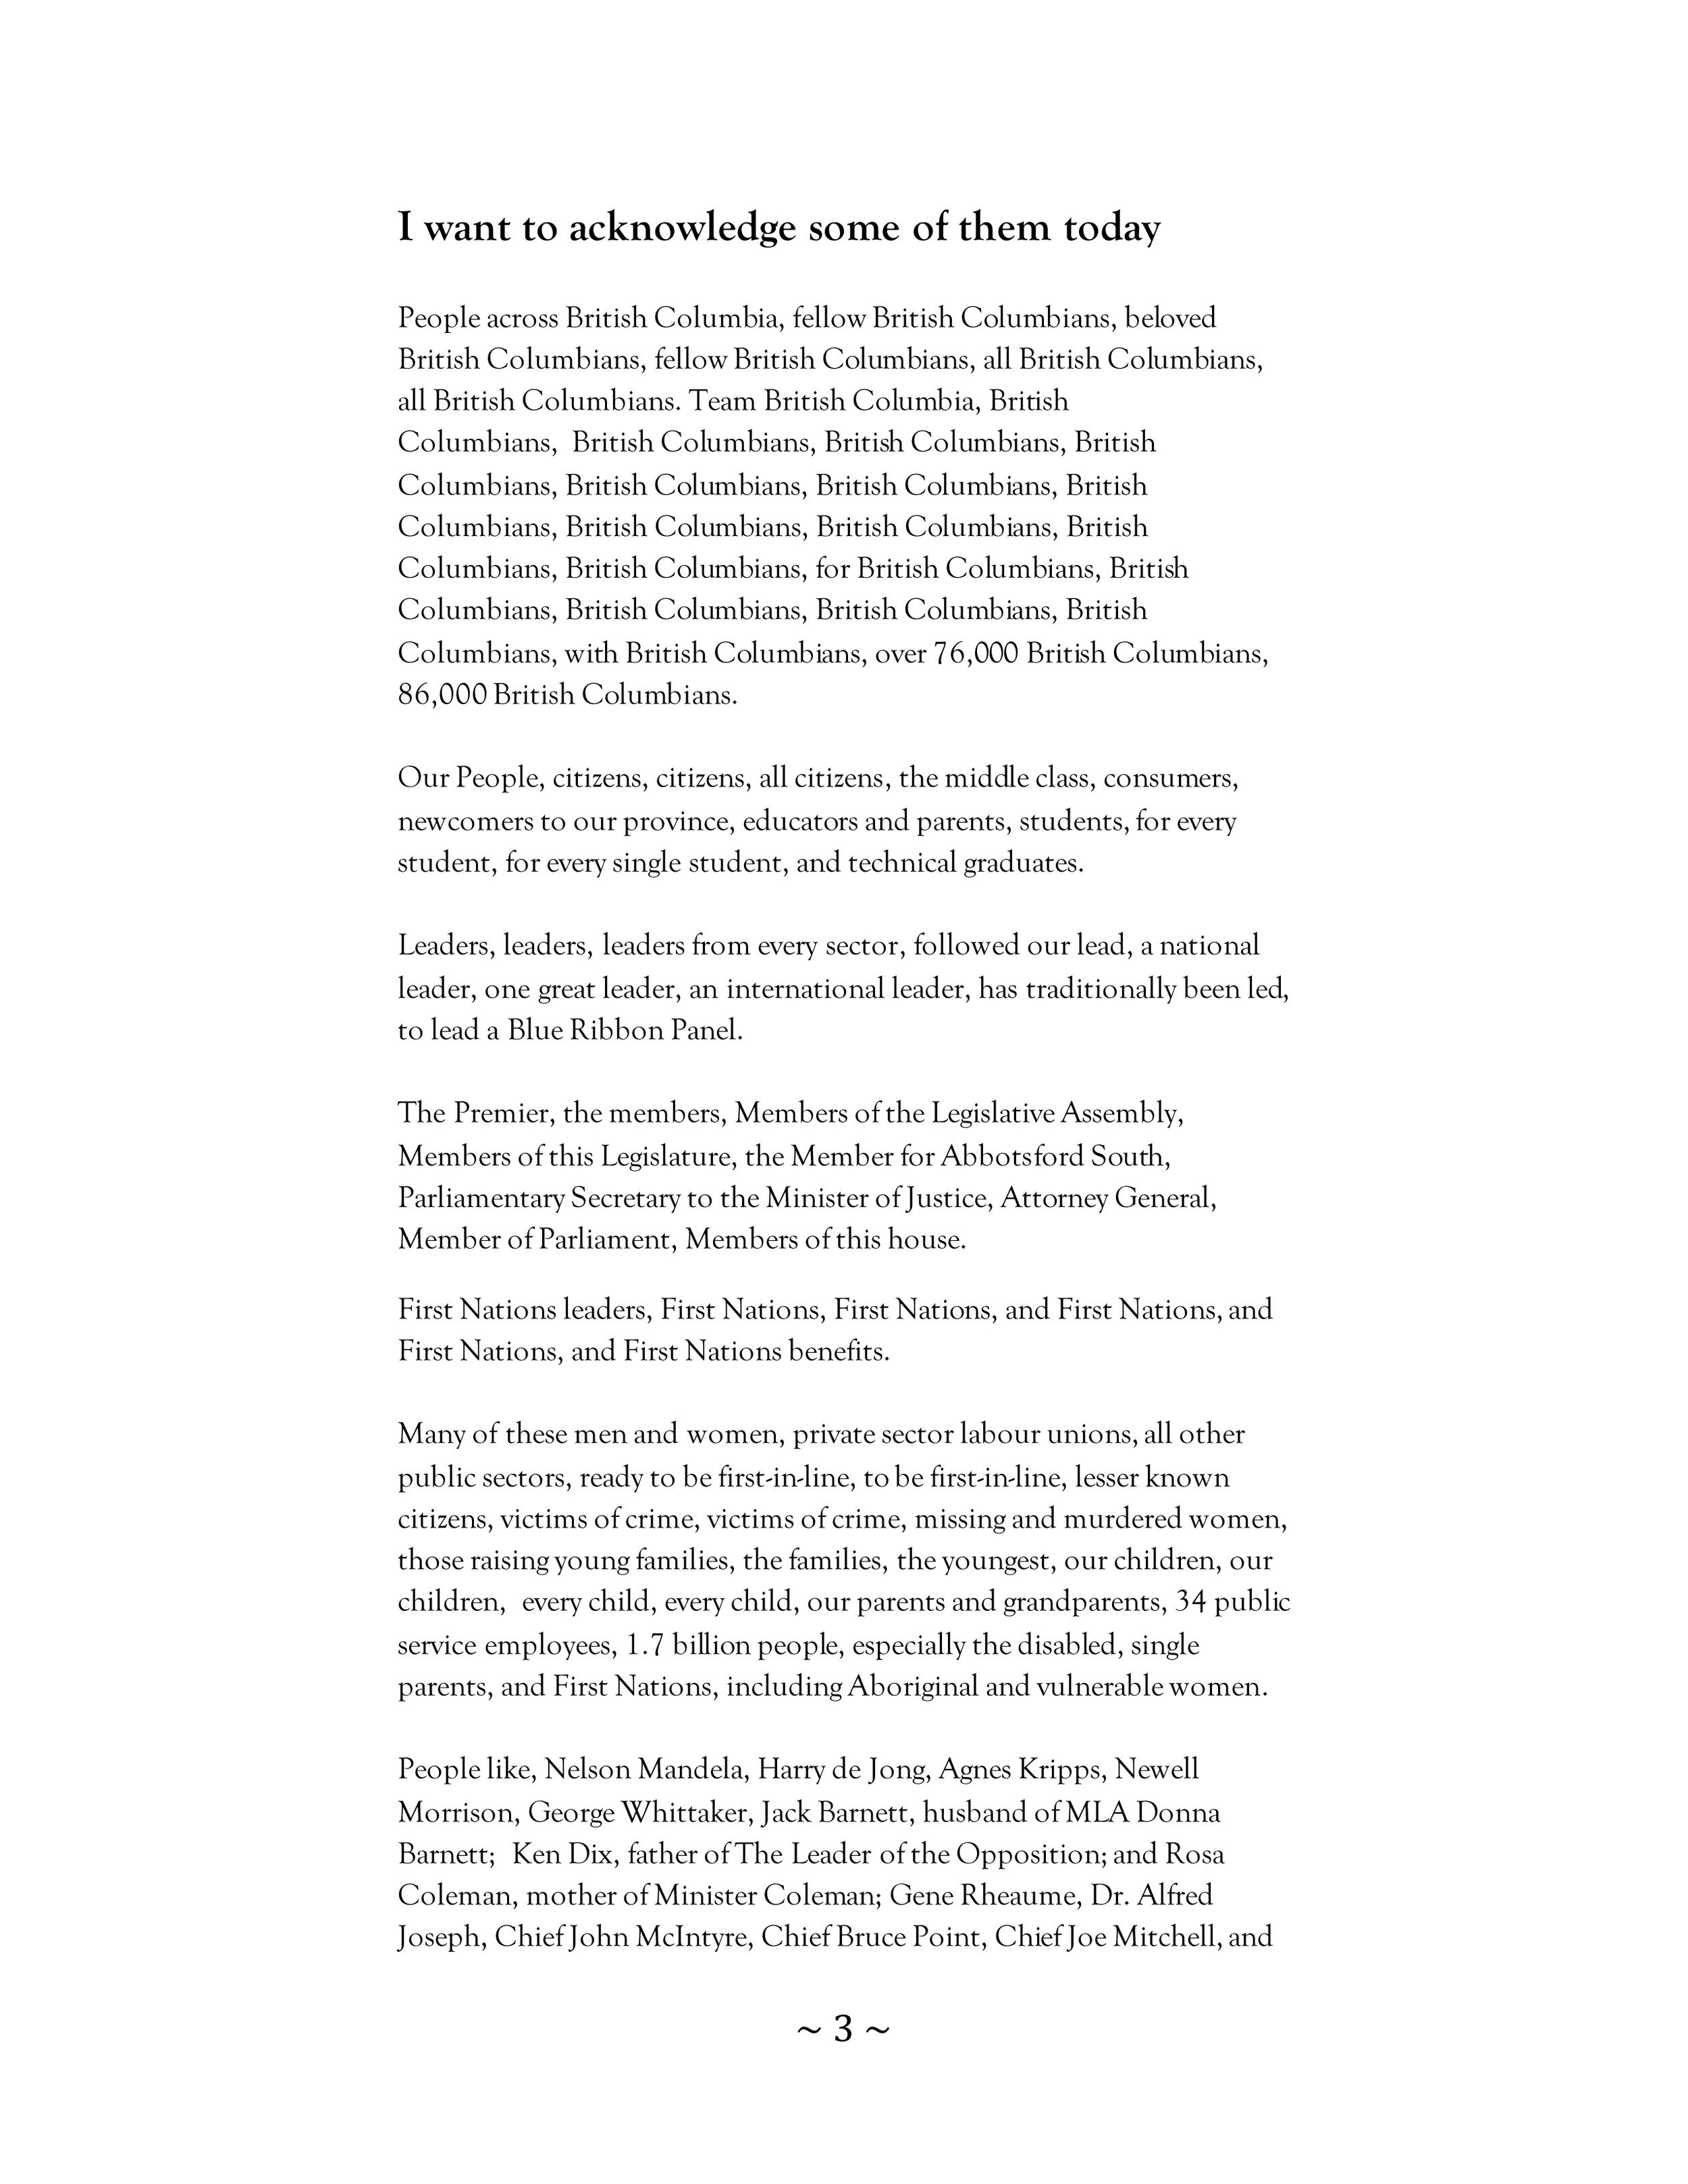 Speech from the Throne 2014-3.jpg